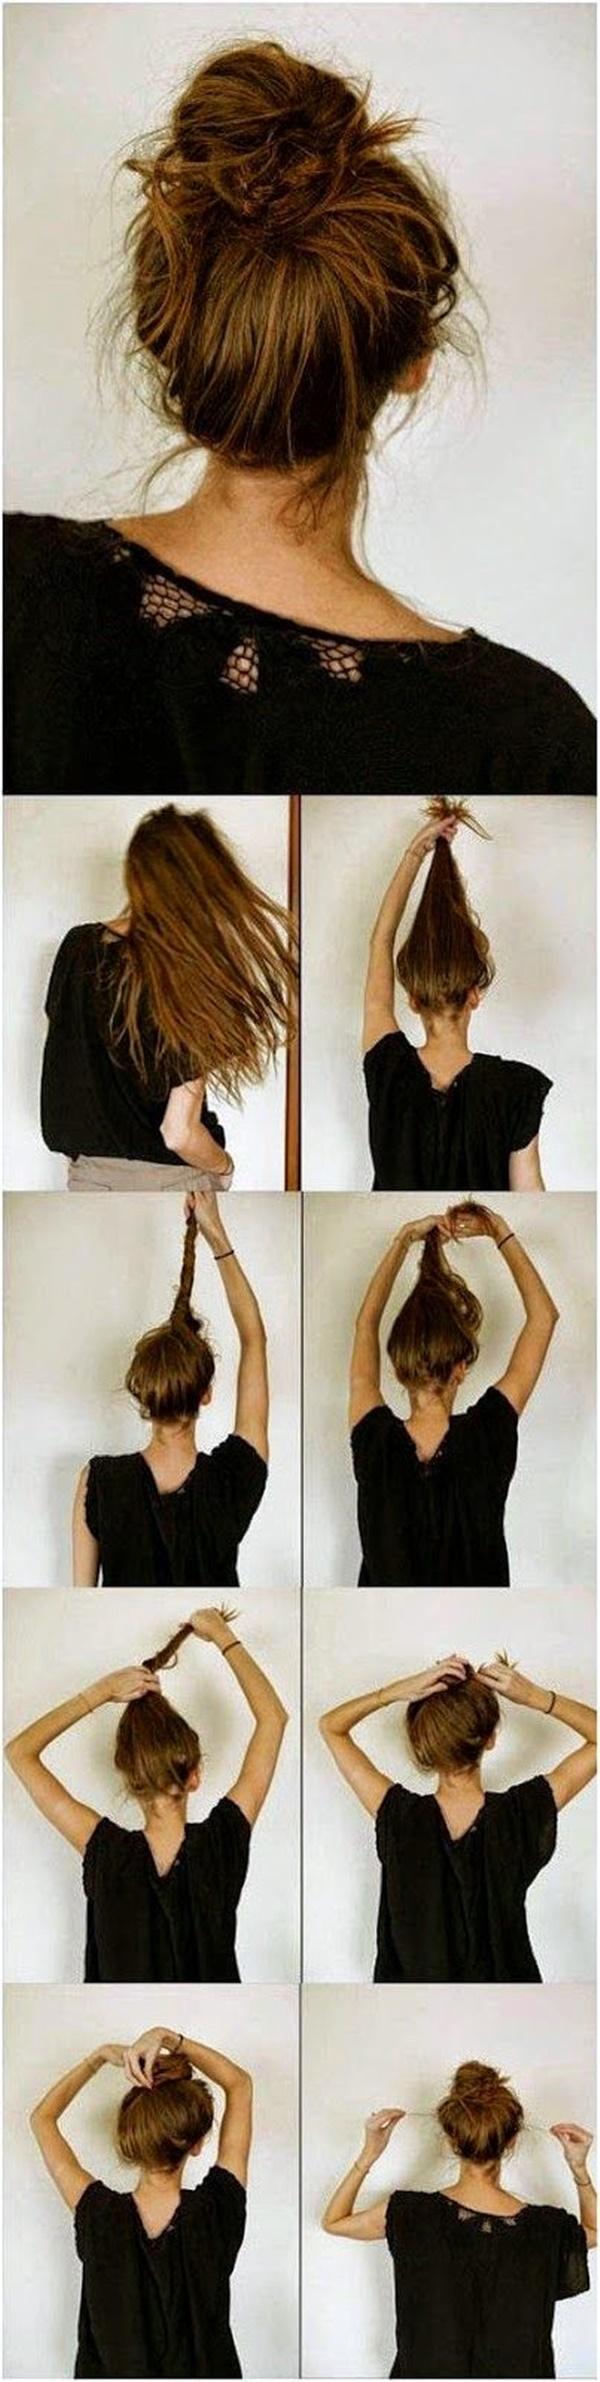 Quickhairstyletutorialsforofficewomen hairstyles